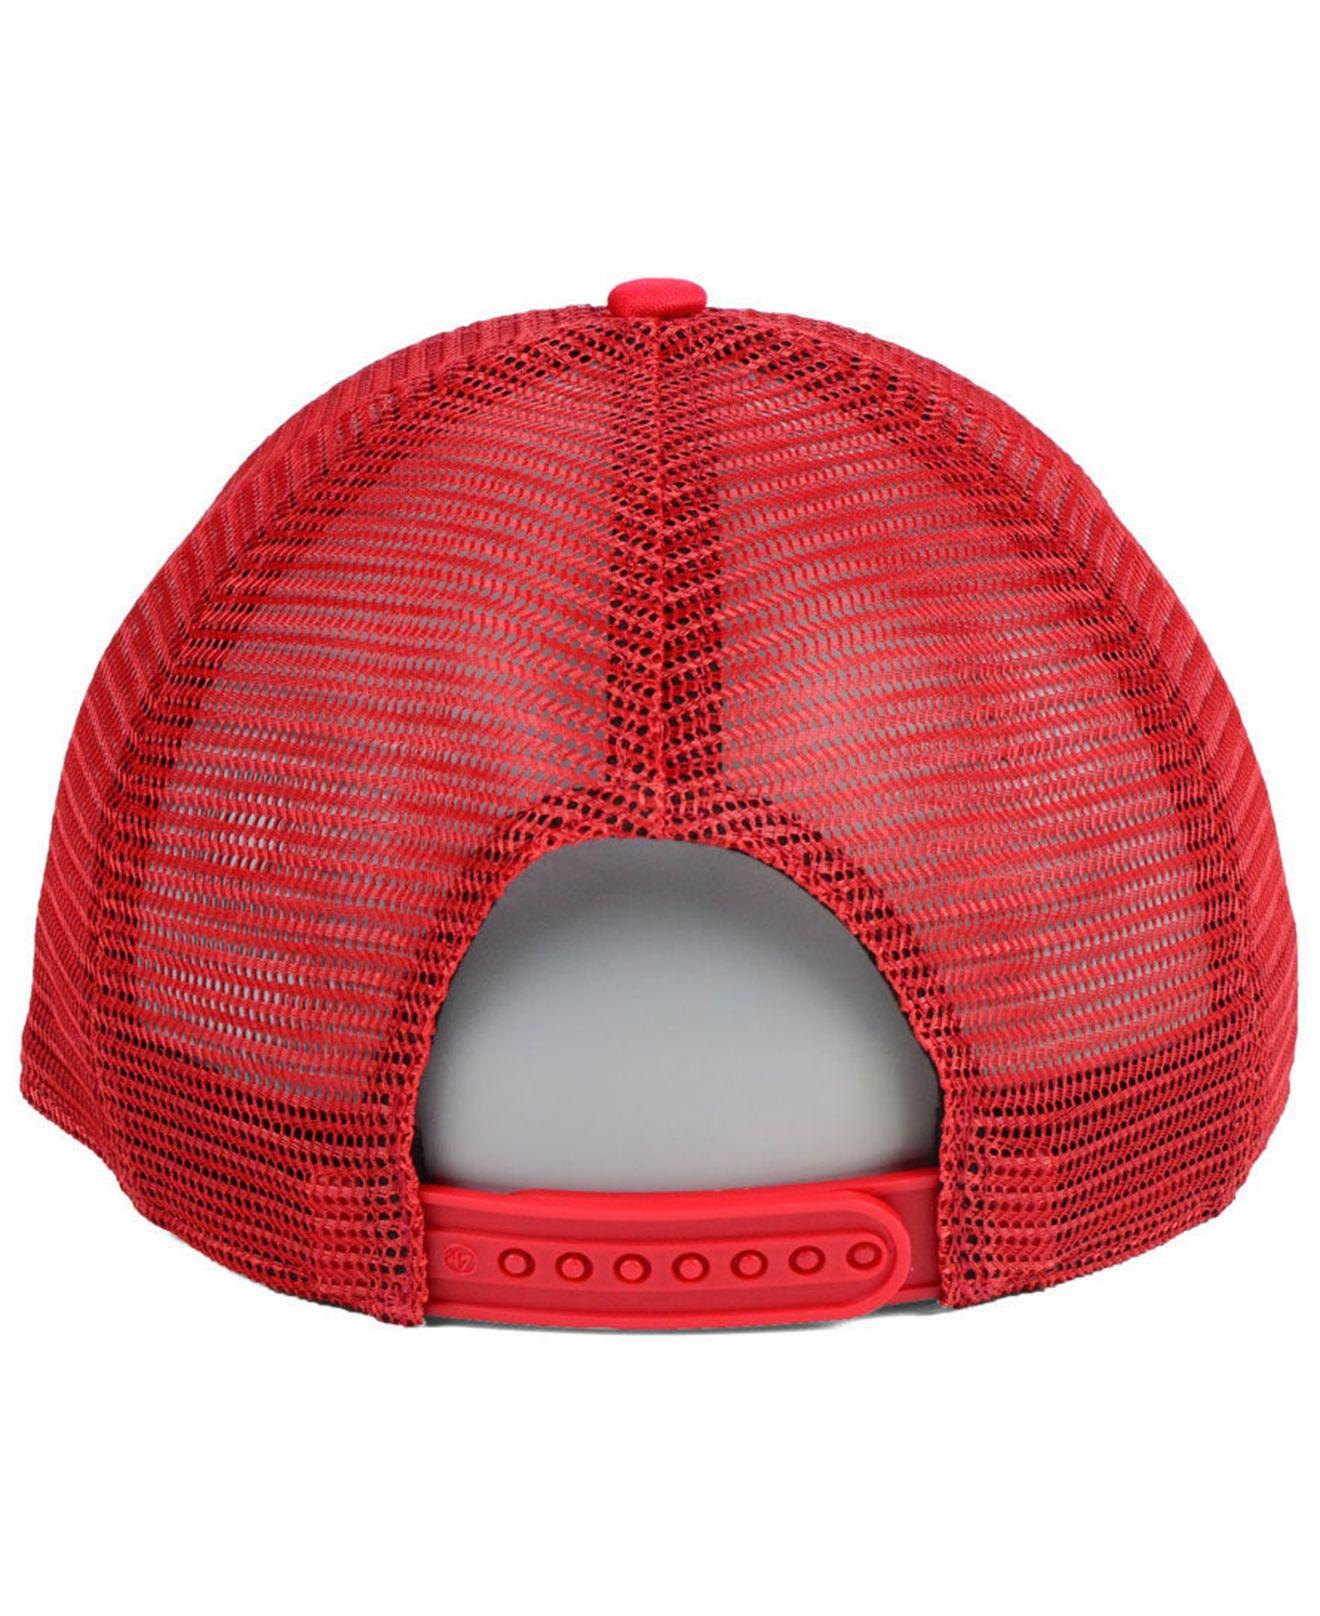 designer fashion 2a92f ca5f4 ... switzerland 47 brand red chicago bulls region mesh mvp cap for men lyst.  view fullscreen